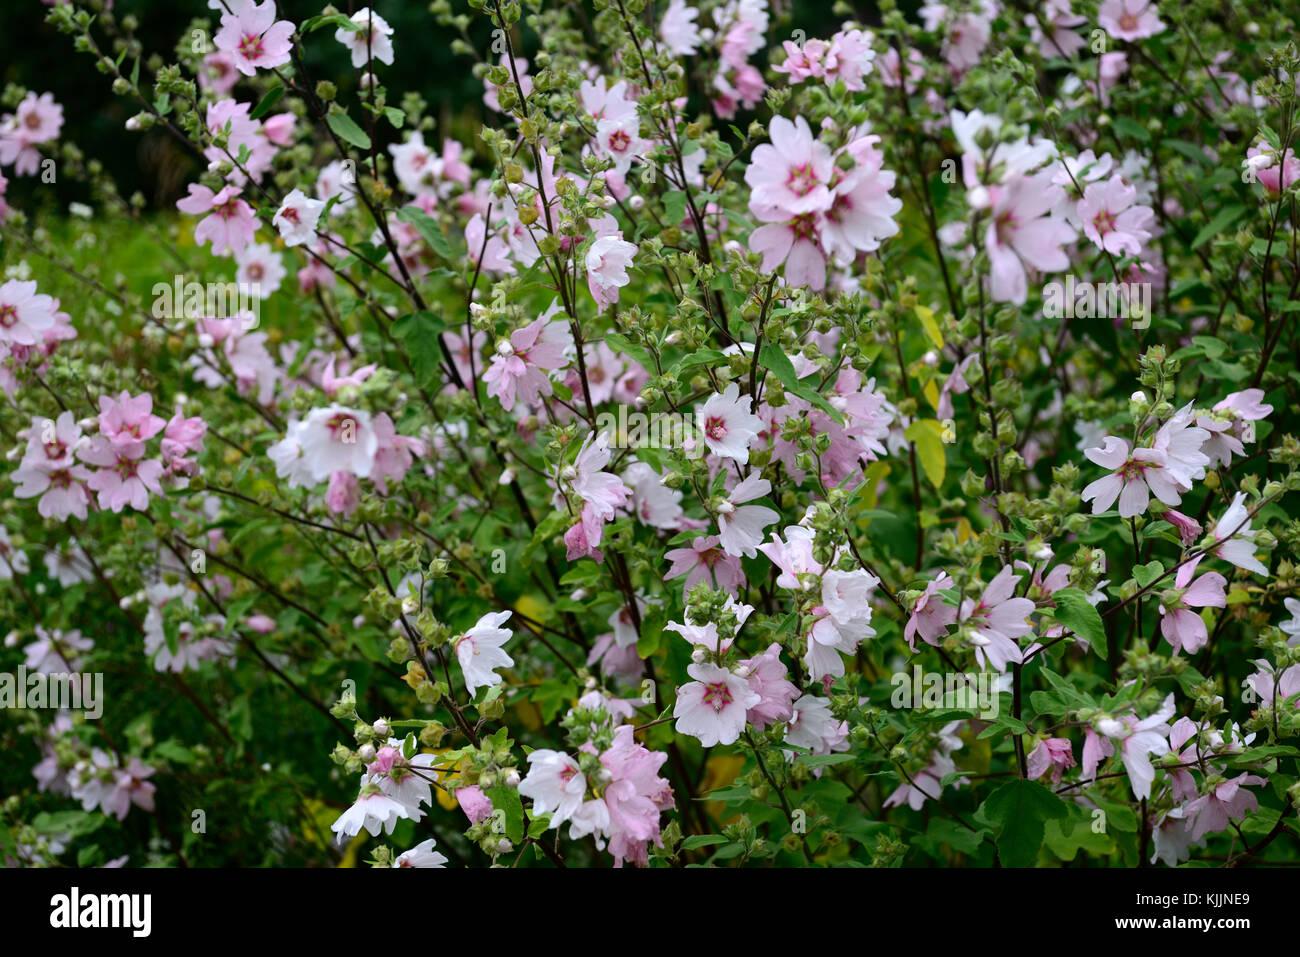 Lavatera barnsley bush mallow pink white flower flowers stock lavatera barnsley bush mallow pink white flower flowers flowering perennial shrub rm floral mightylinksfo